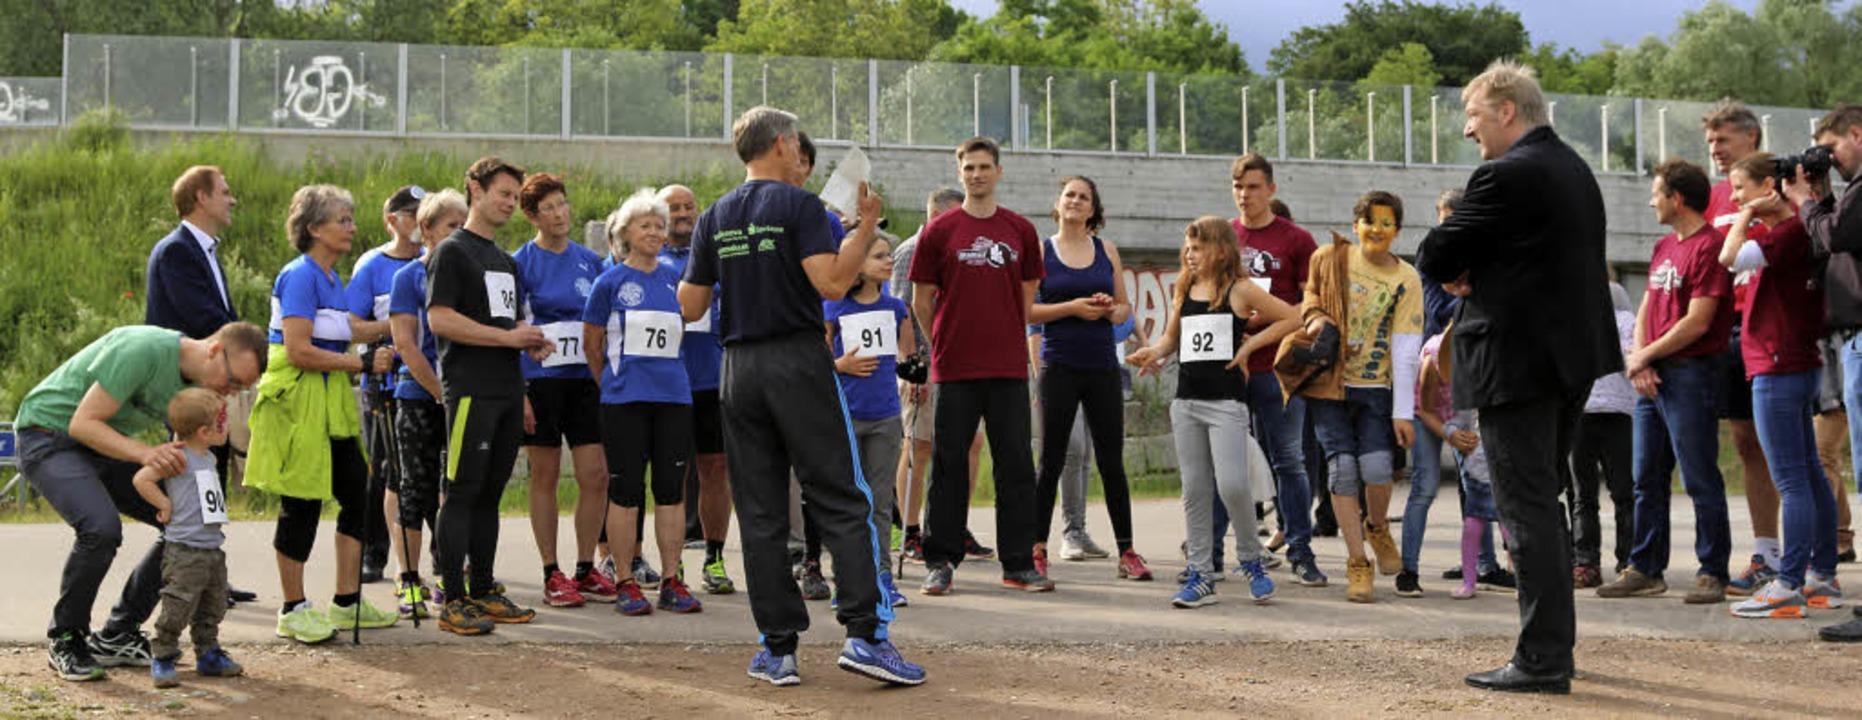 Bürgermeister Michael Wilke erläutert ...as es bei der 1000-Meter-Strecke geht.  | Foto: Katharina Bartsch